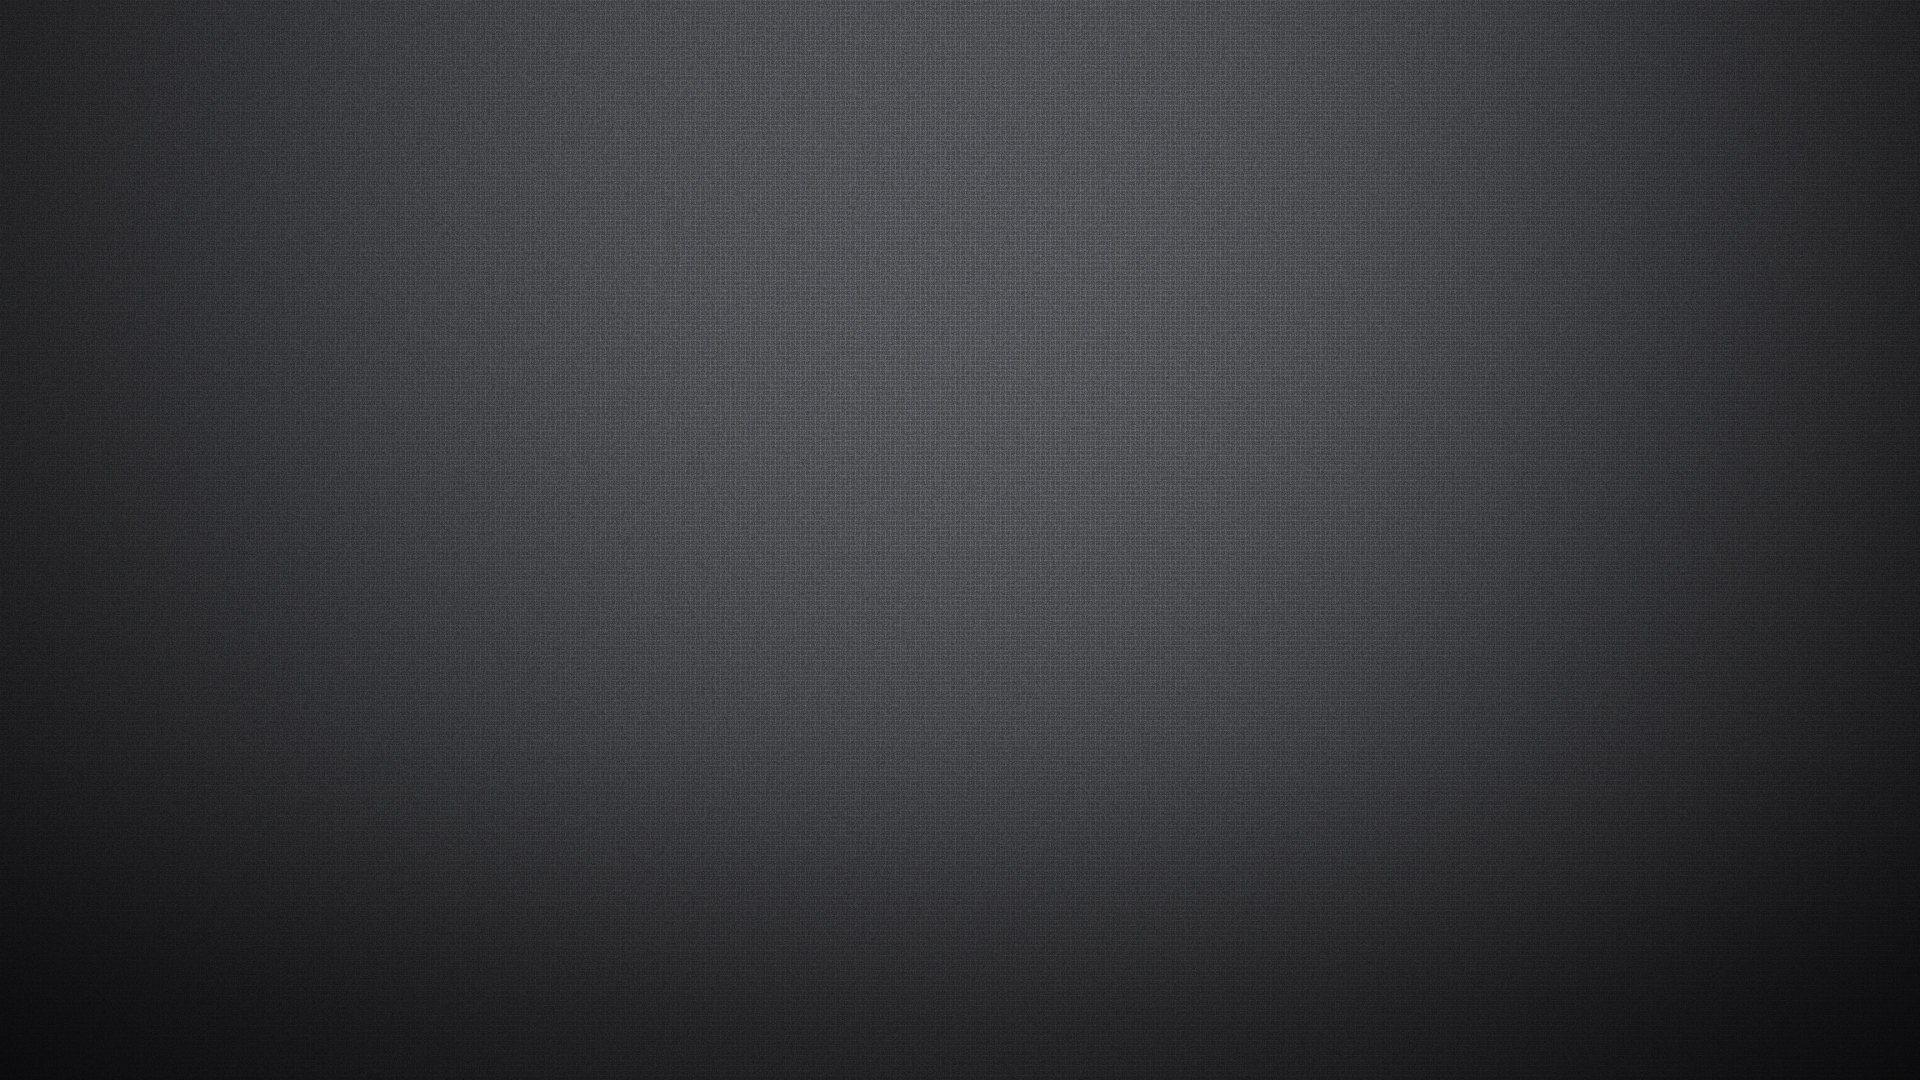 HD iPad Wallpapers 2048x1536 - WallpaperSafari